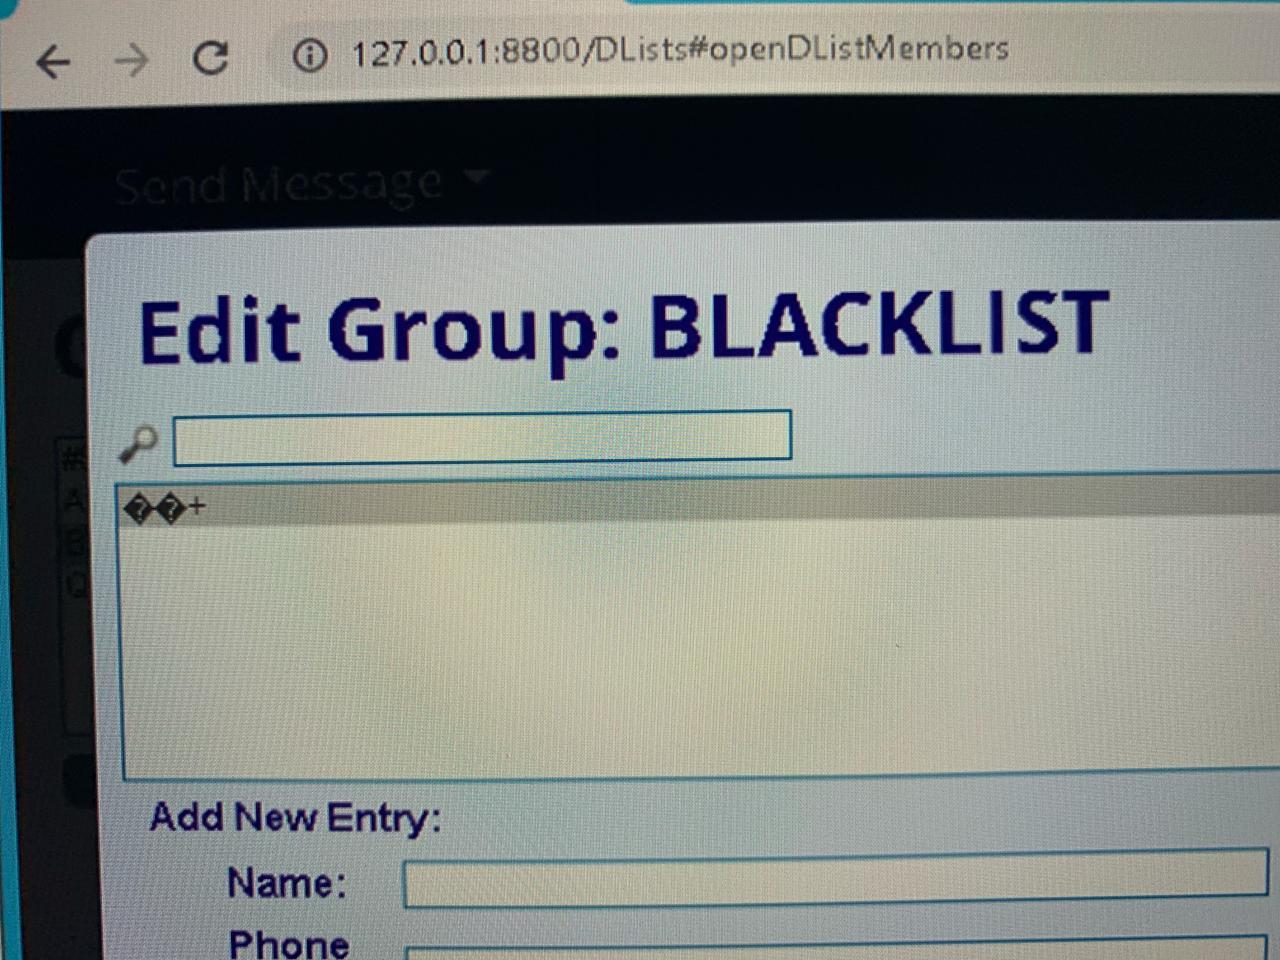 BLACKLIST